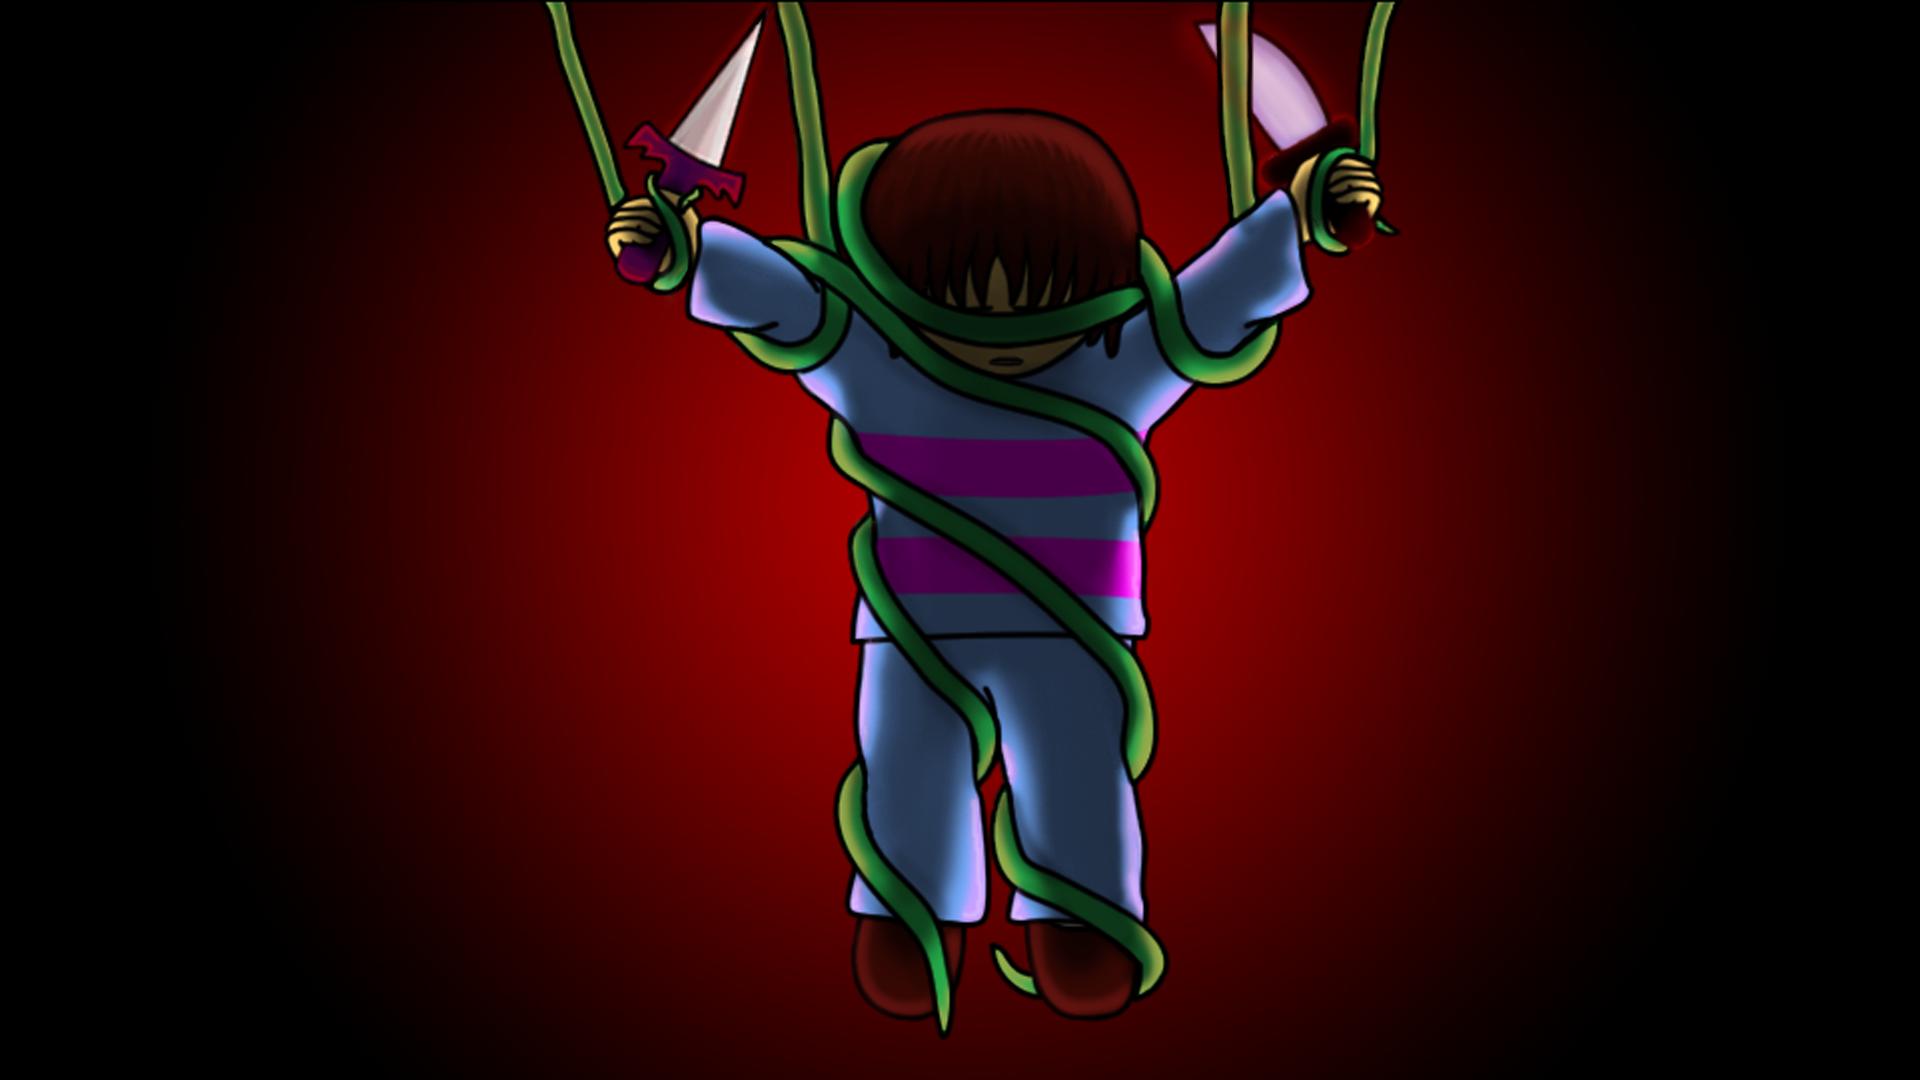 Dangling by Dark Threads